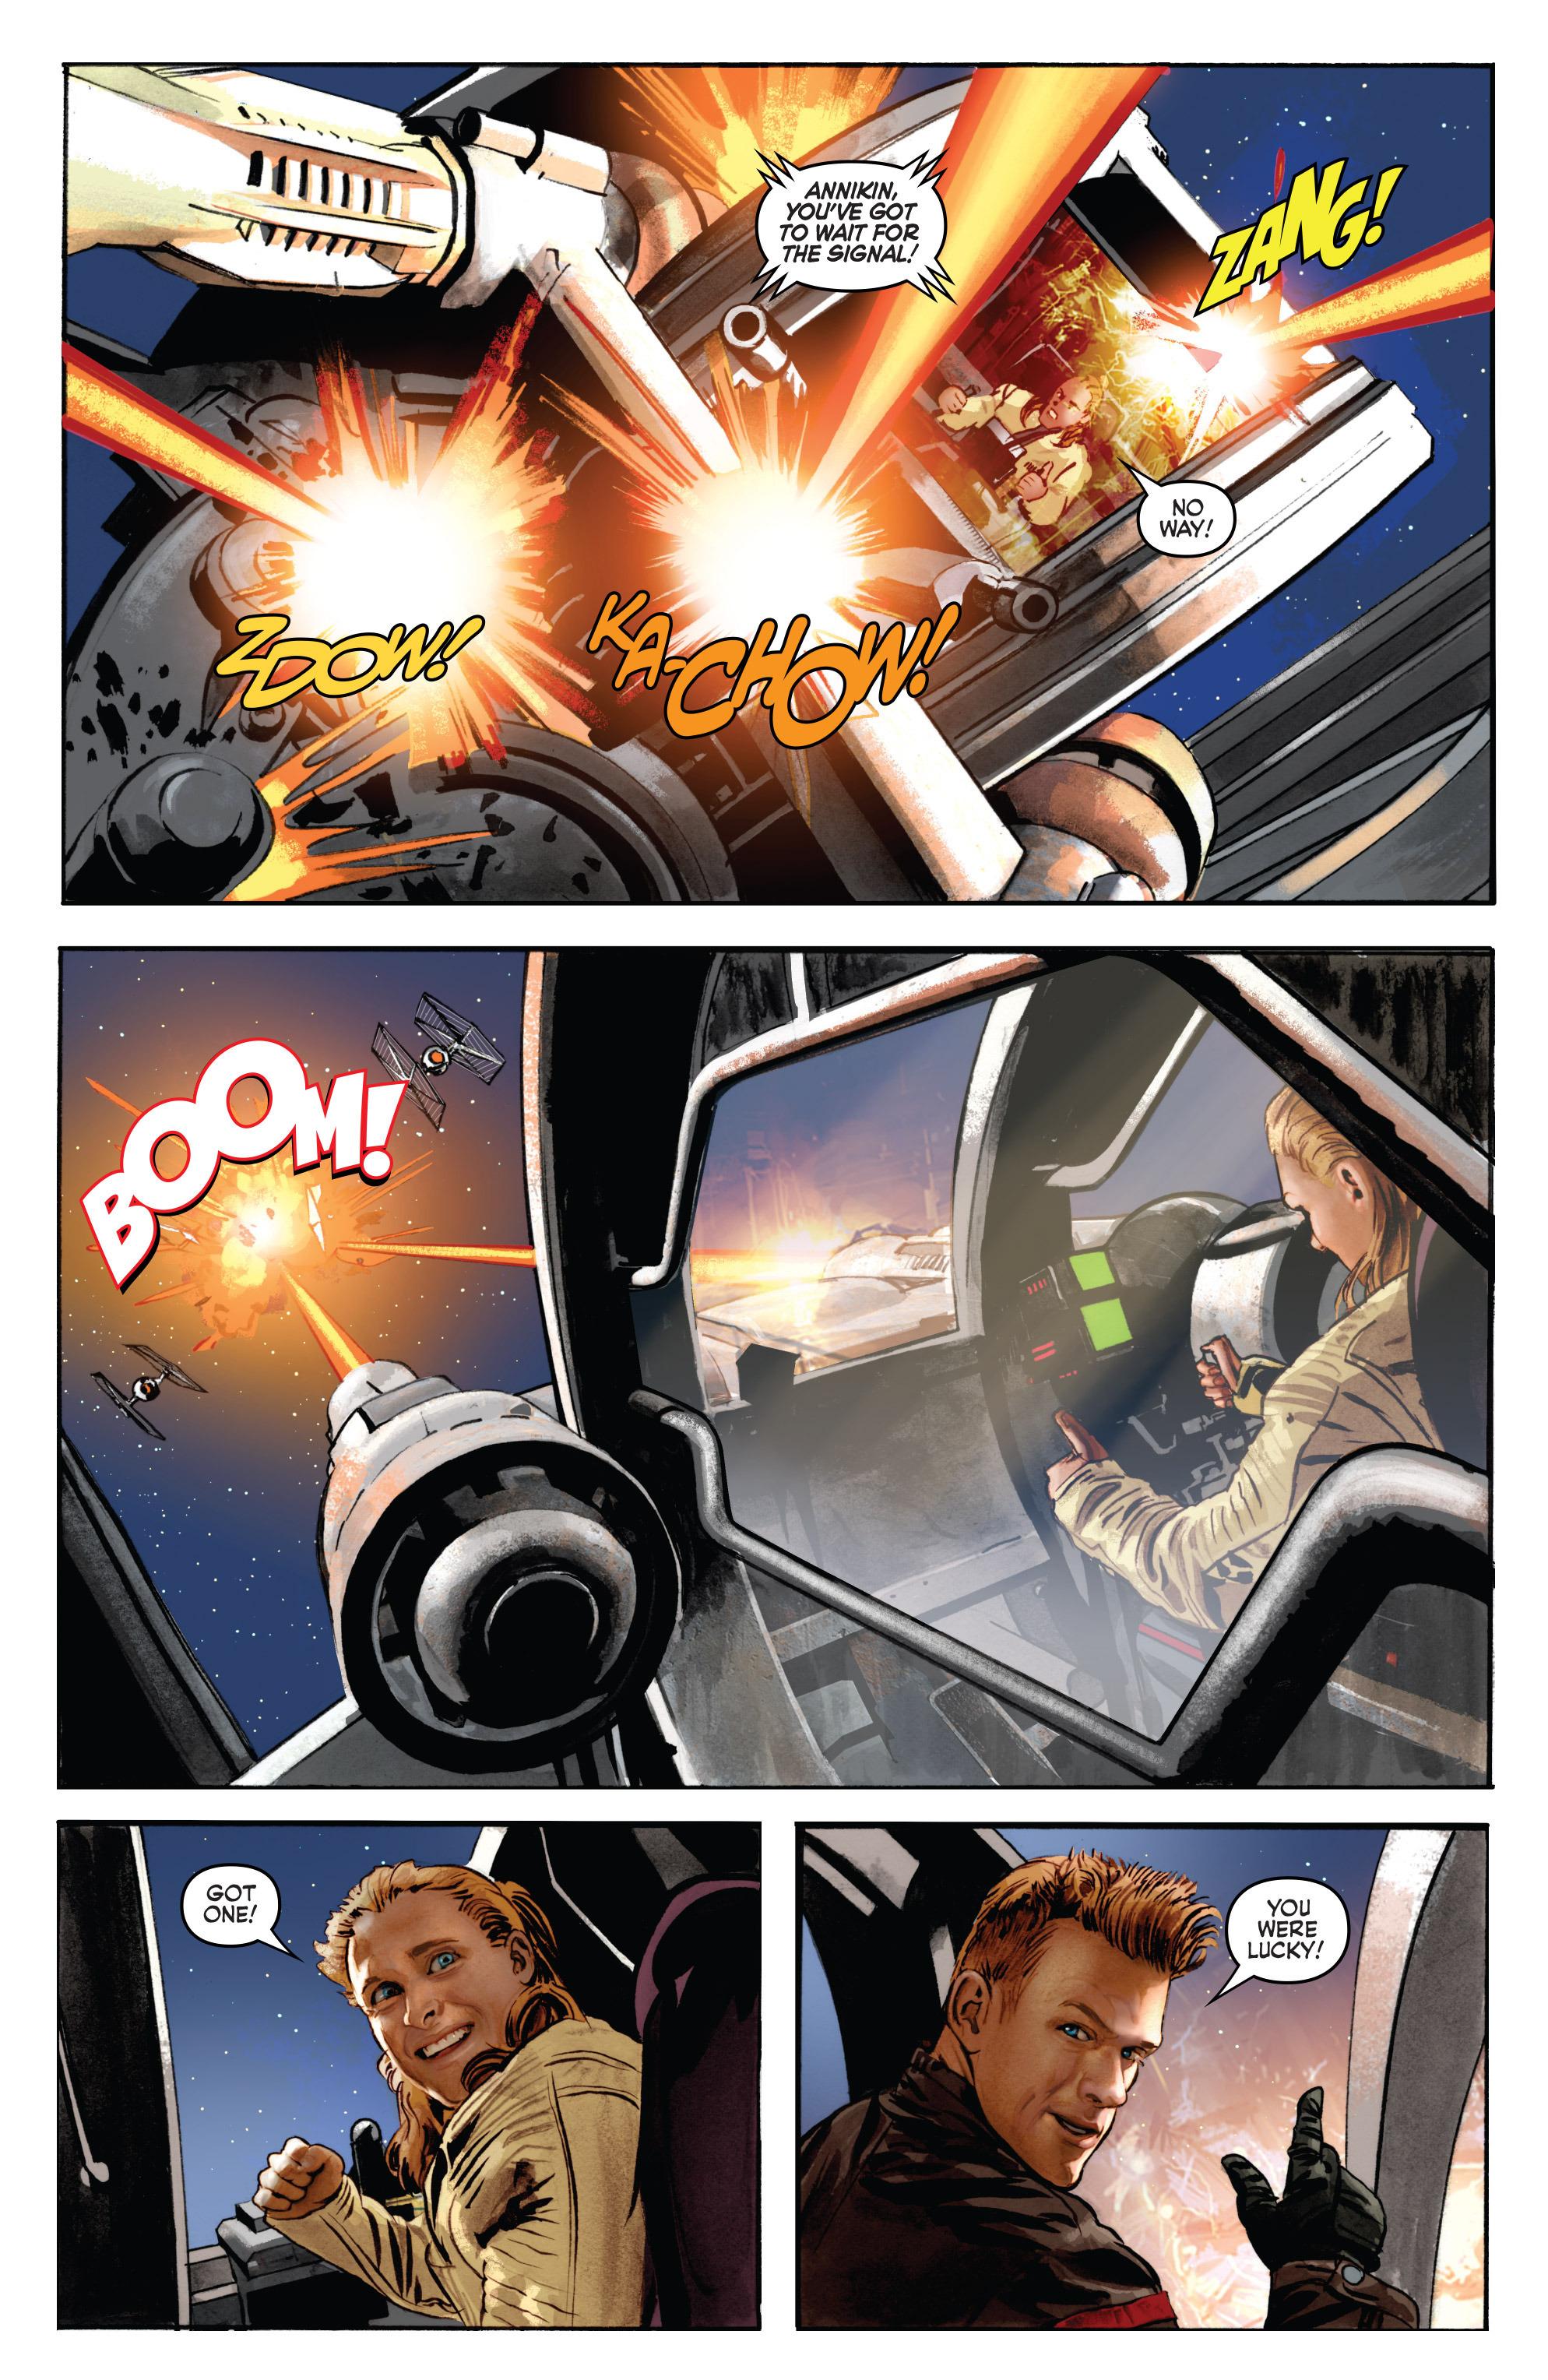 THE STAR WARS comic (2015, Marvel edition) Vol.7 3